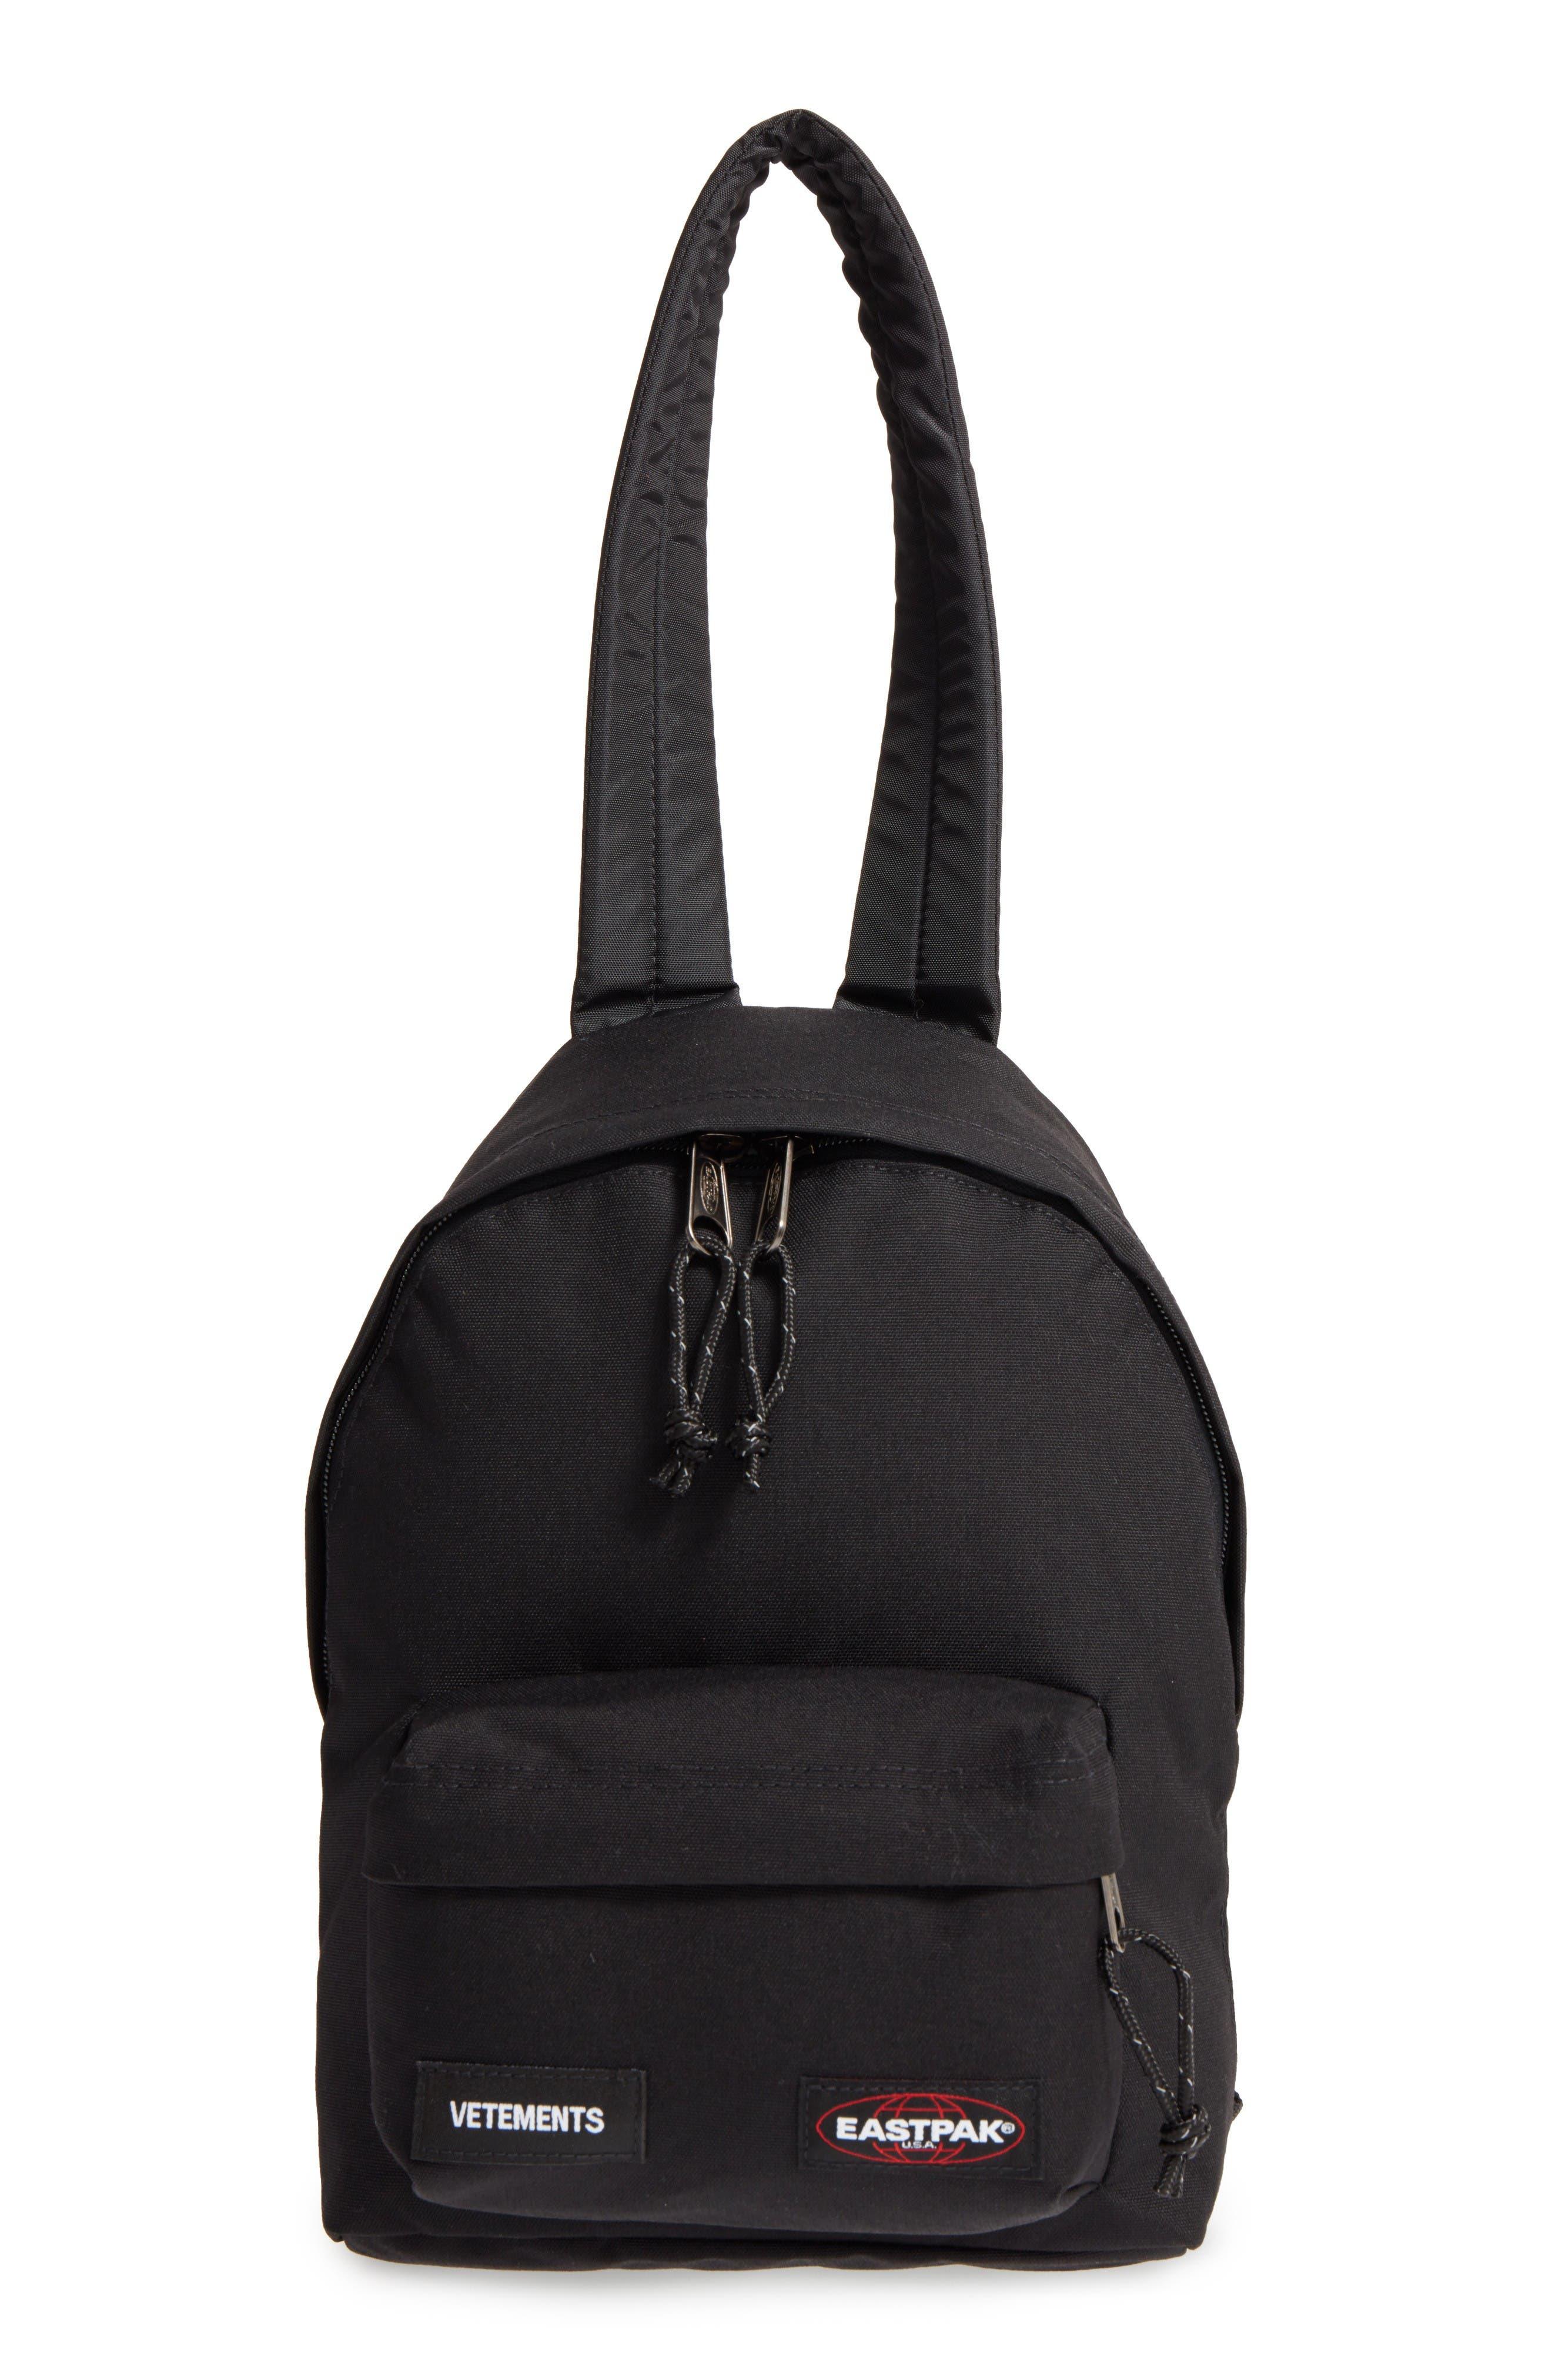 Vetements x Eastpak Mini Backpack